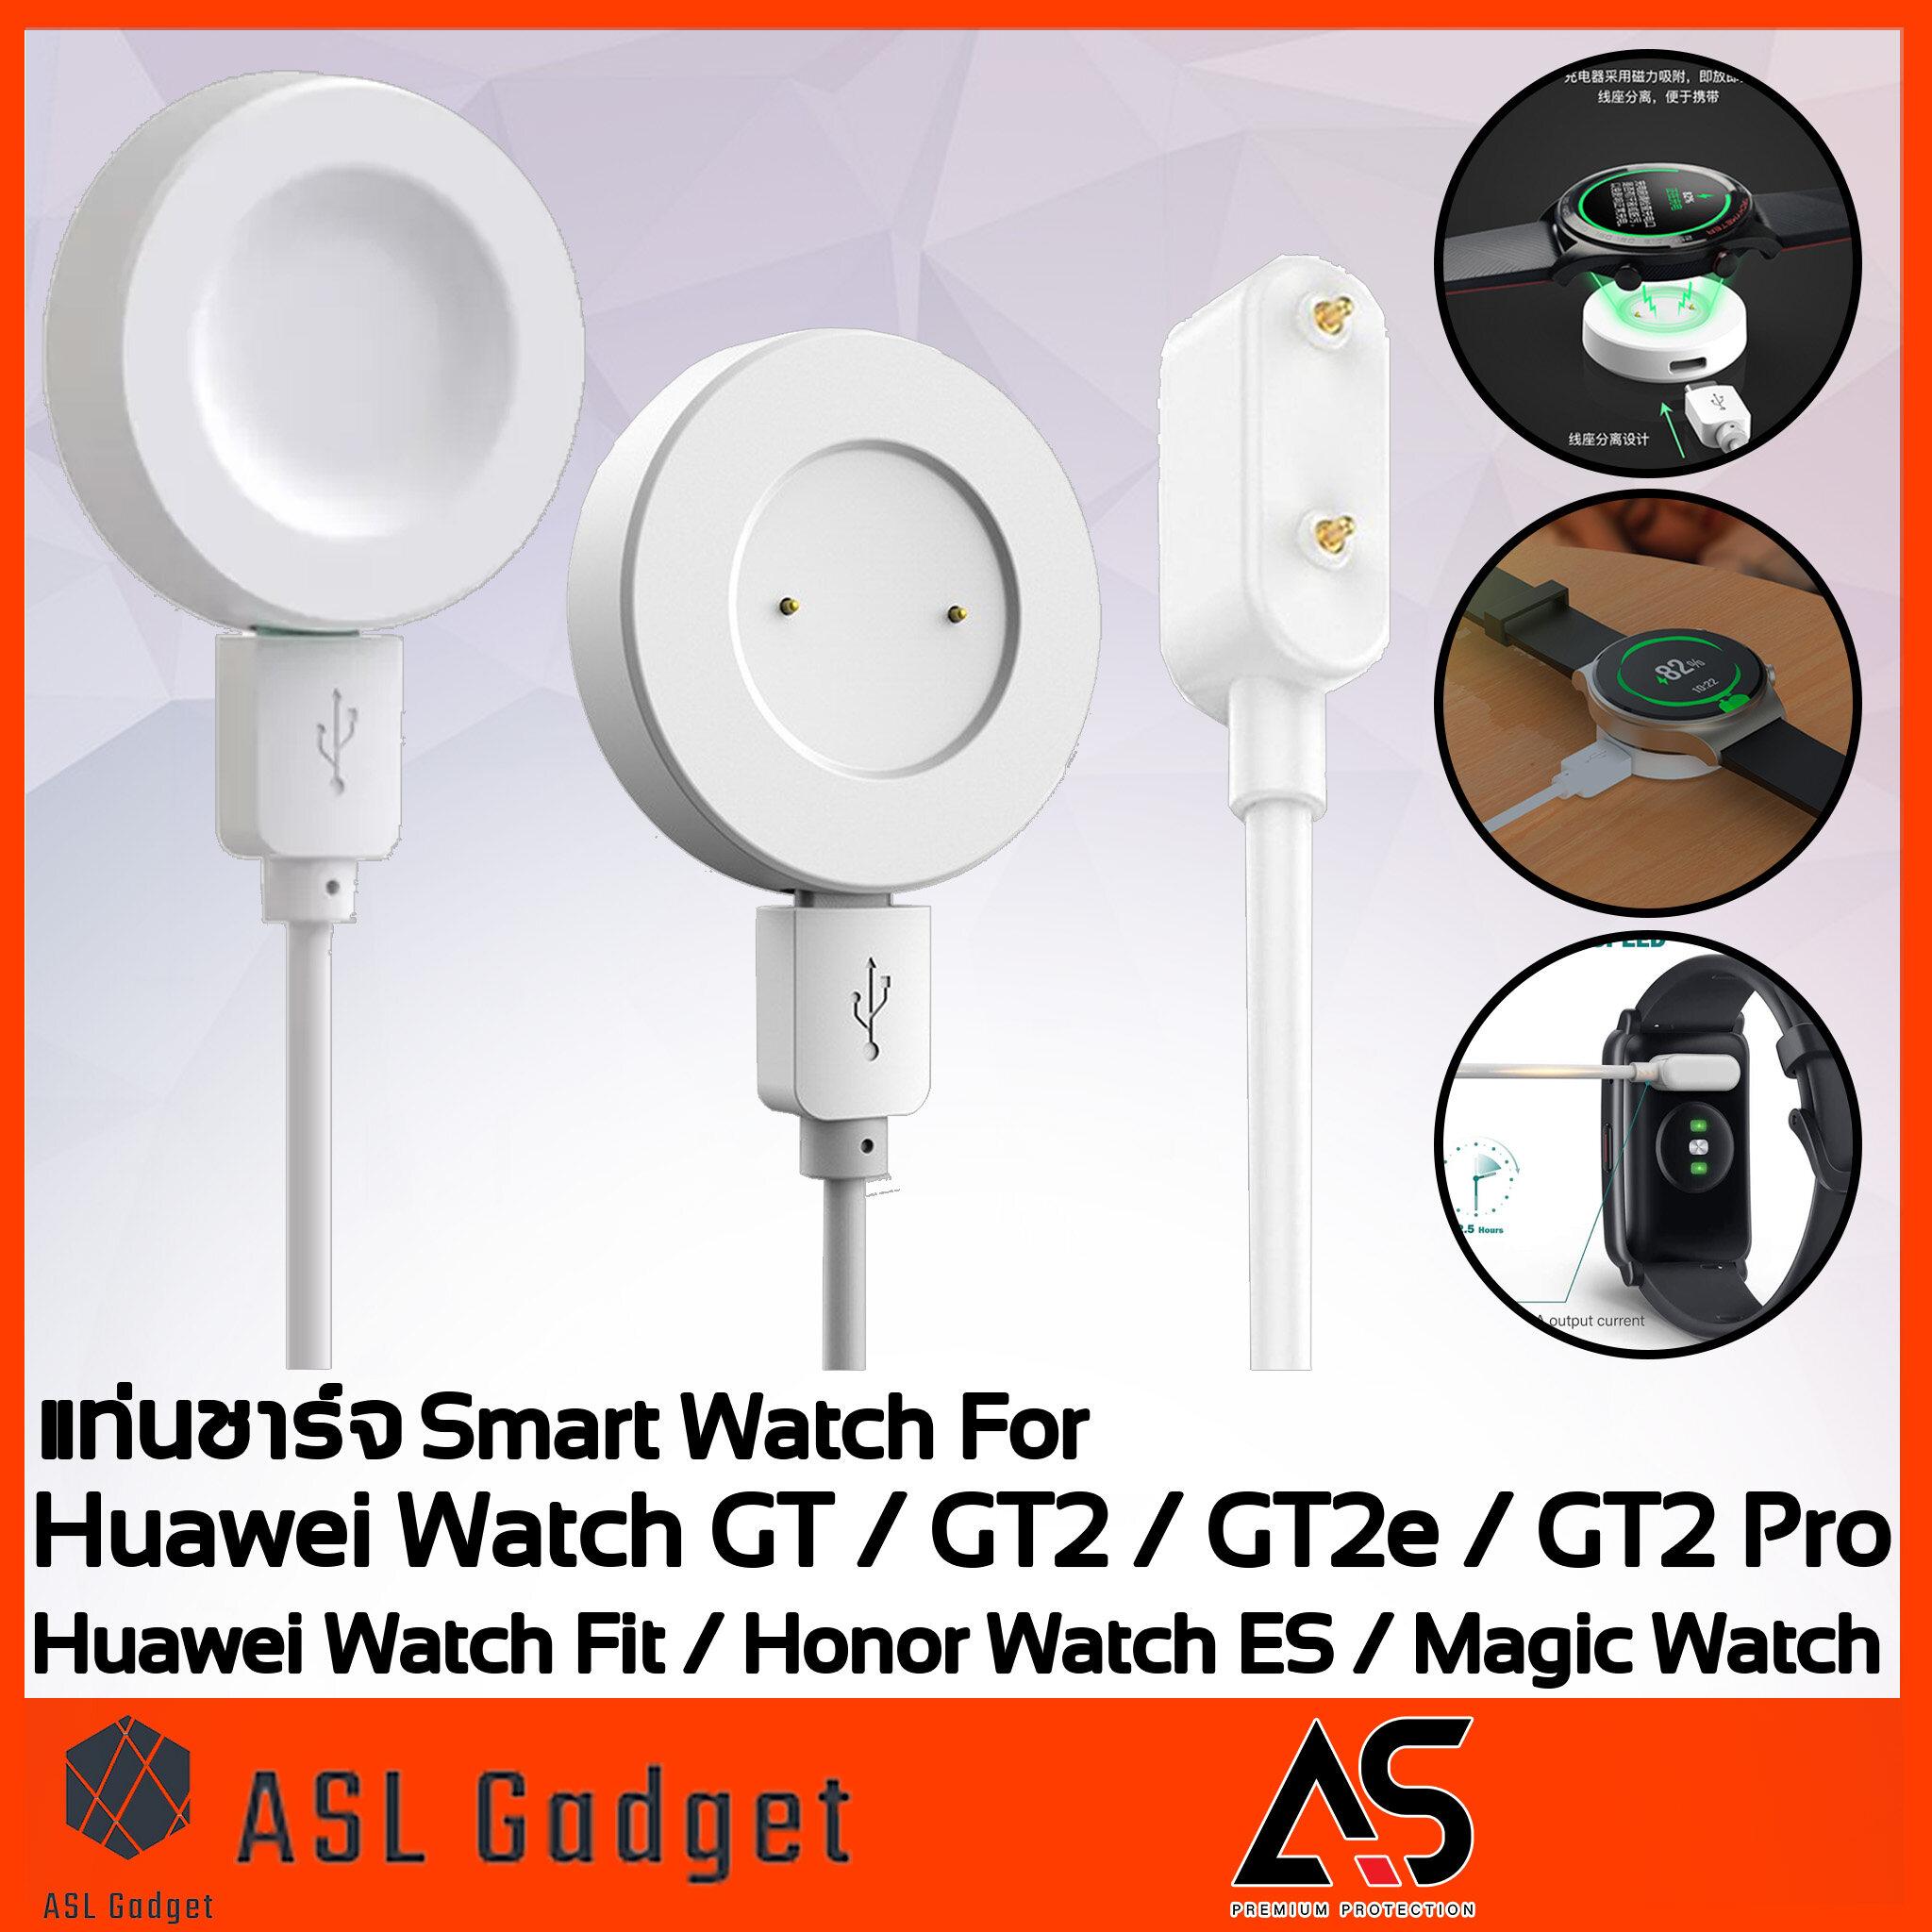 As แท่นชาร์จ For Huawei Watch Gt2 Pro / Watch Fit / Gt2 / Gt / Magic Watch น้ำหนักเบา พกพาง่าย พร้อม Adapter และสาย Usb.